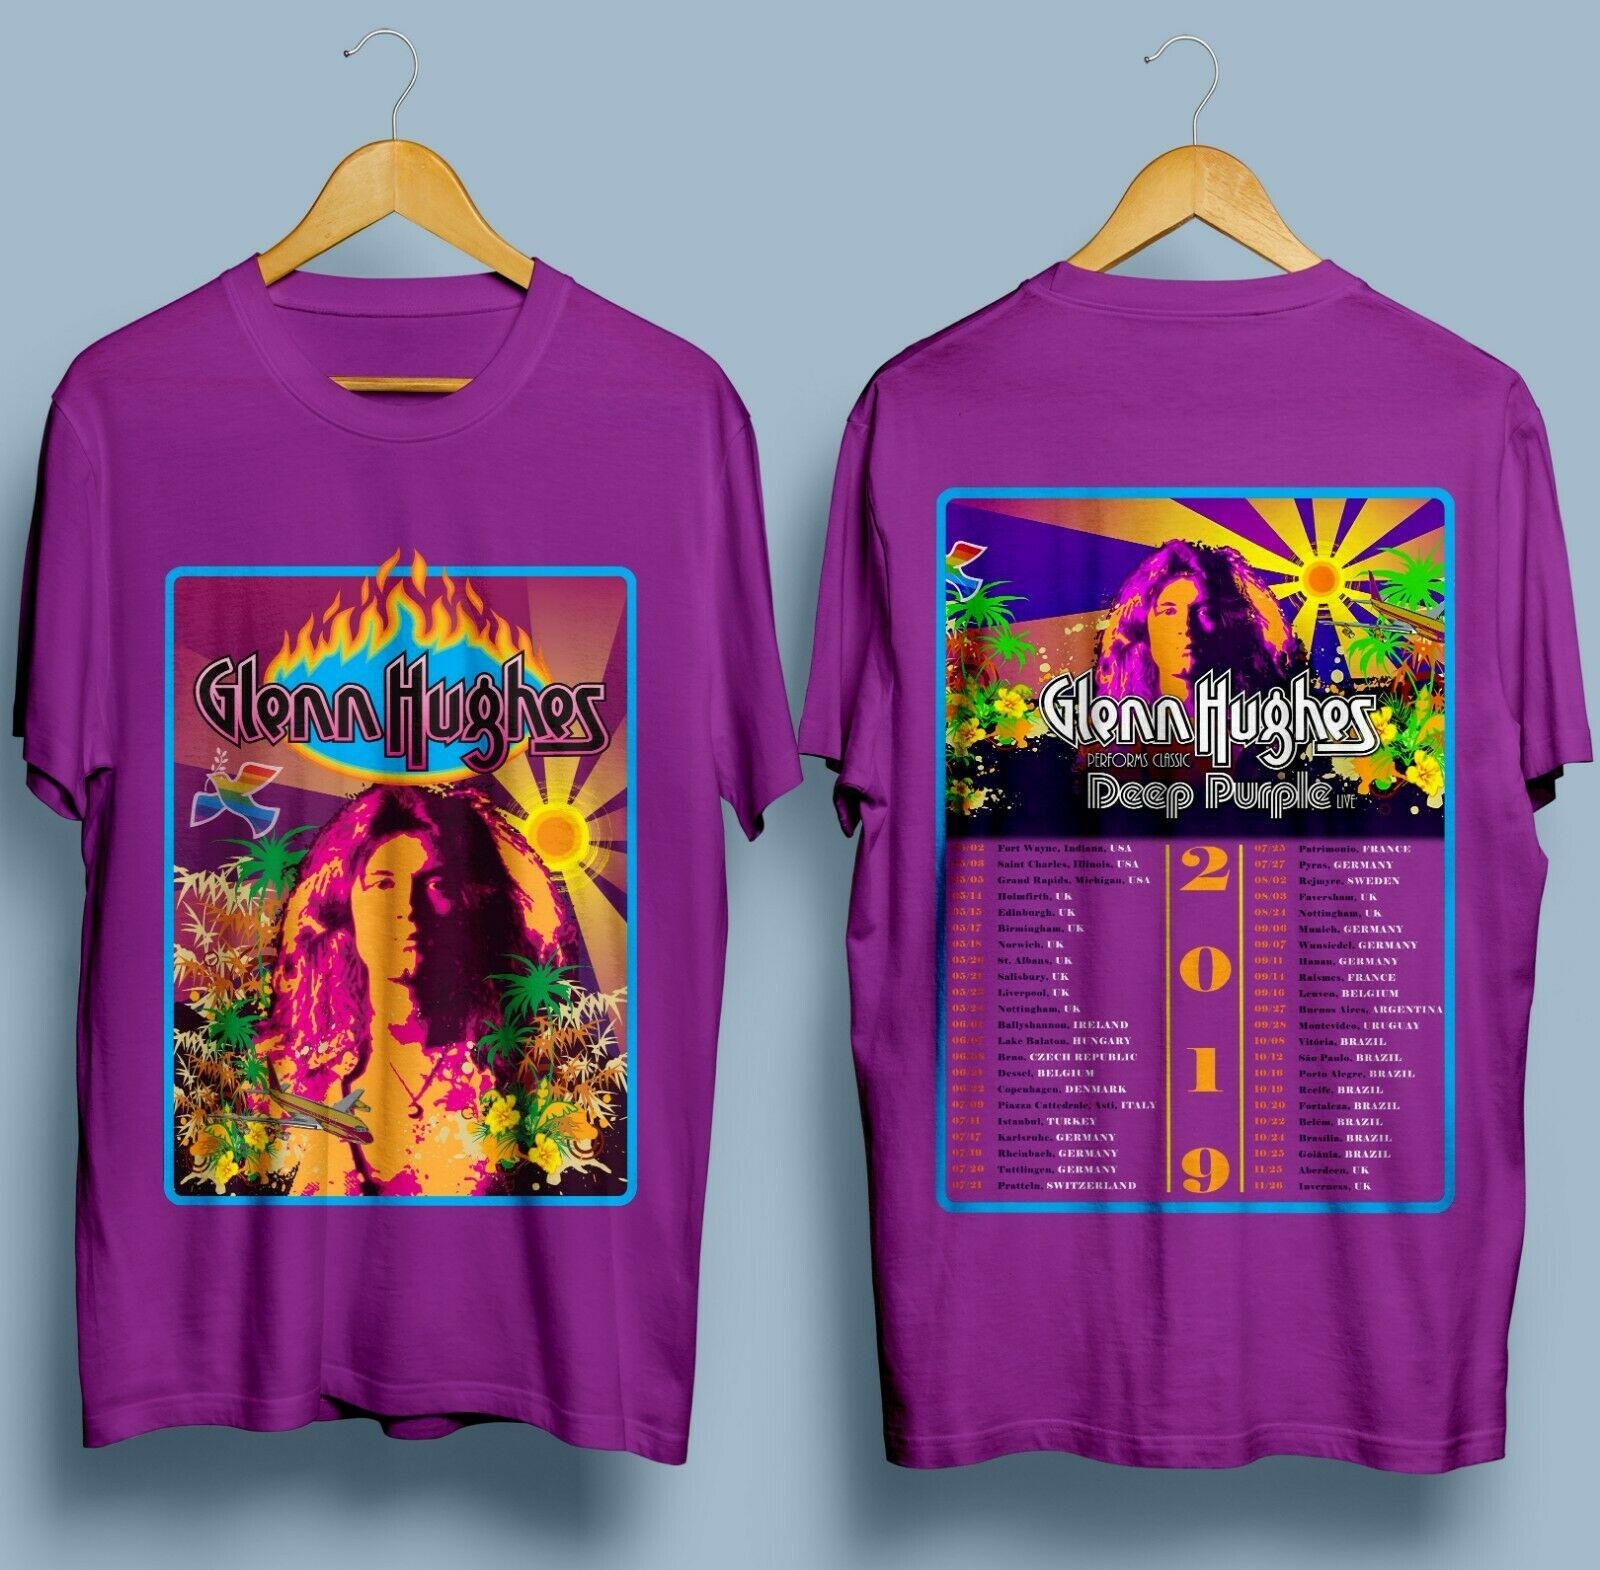 ¡Nuevo! Camiseta clásica para hombre de 2019 pulgadas de color morado profundo de GLENN Hugues S - 3XL